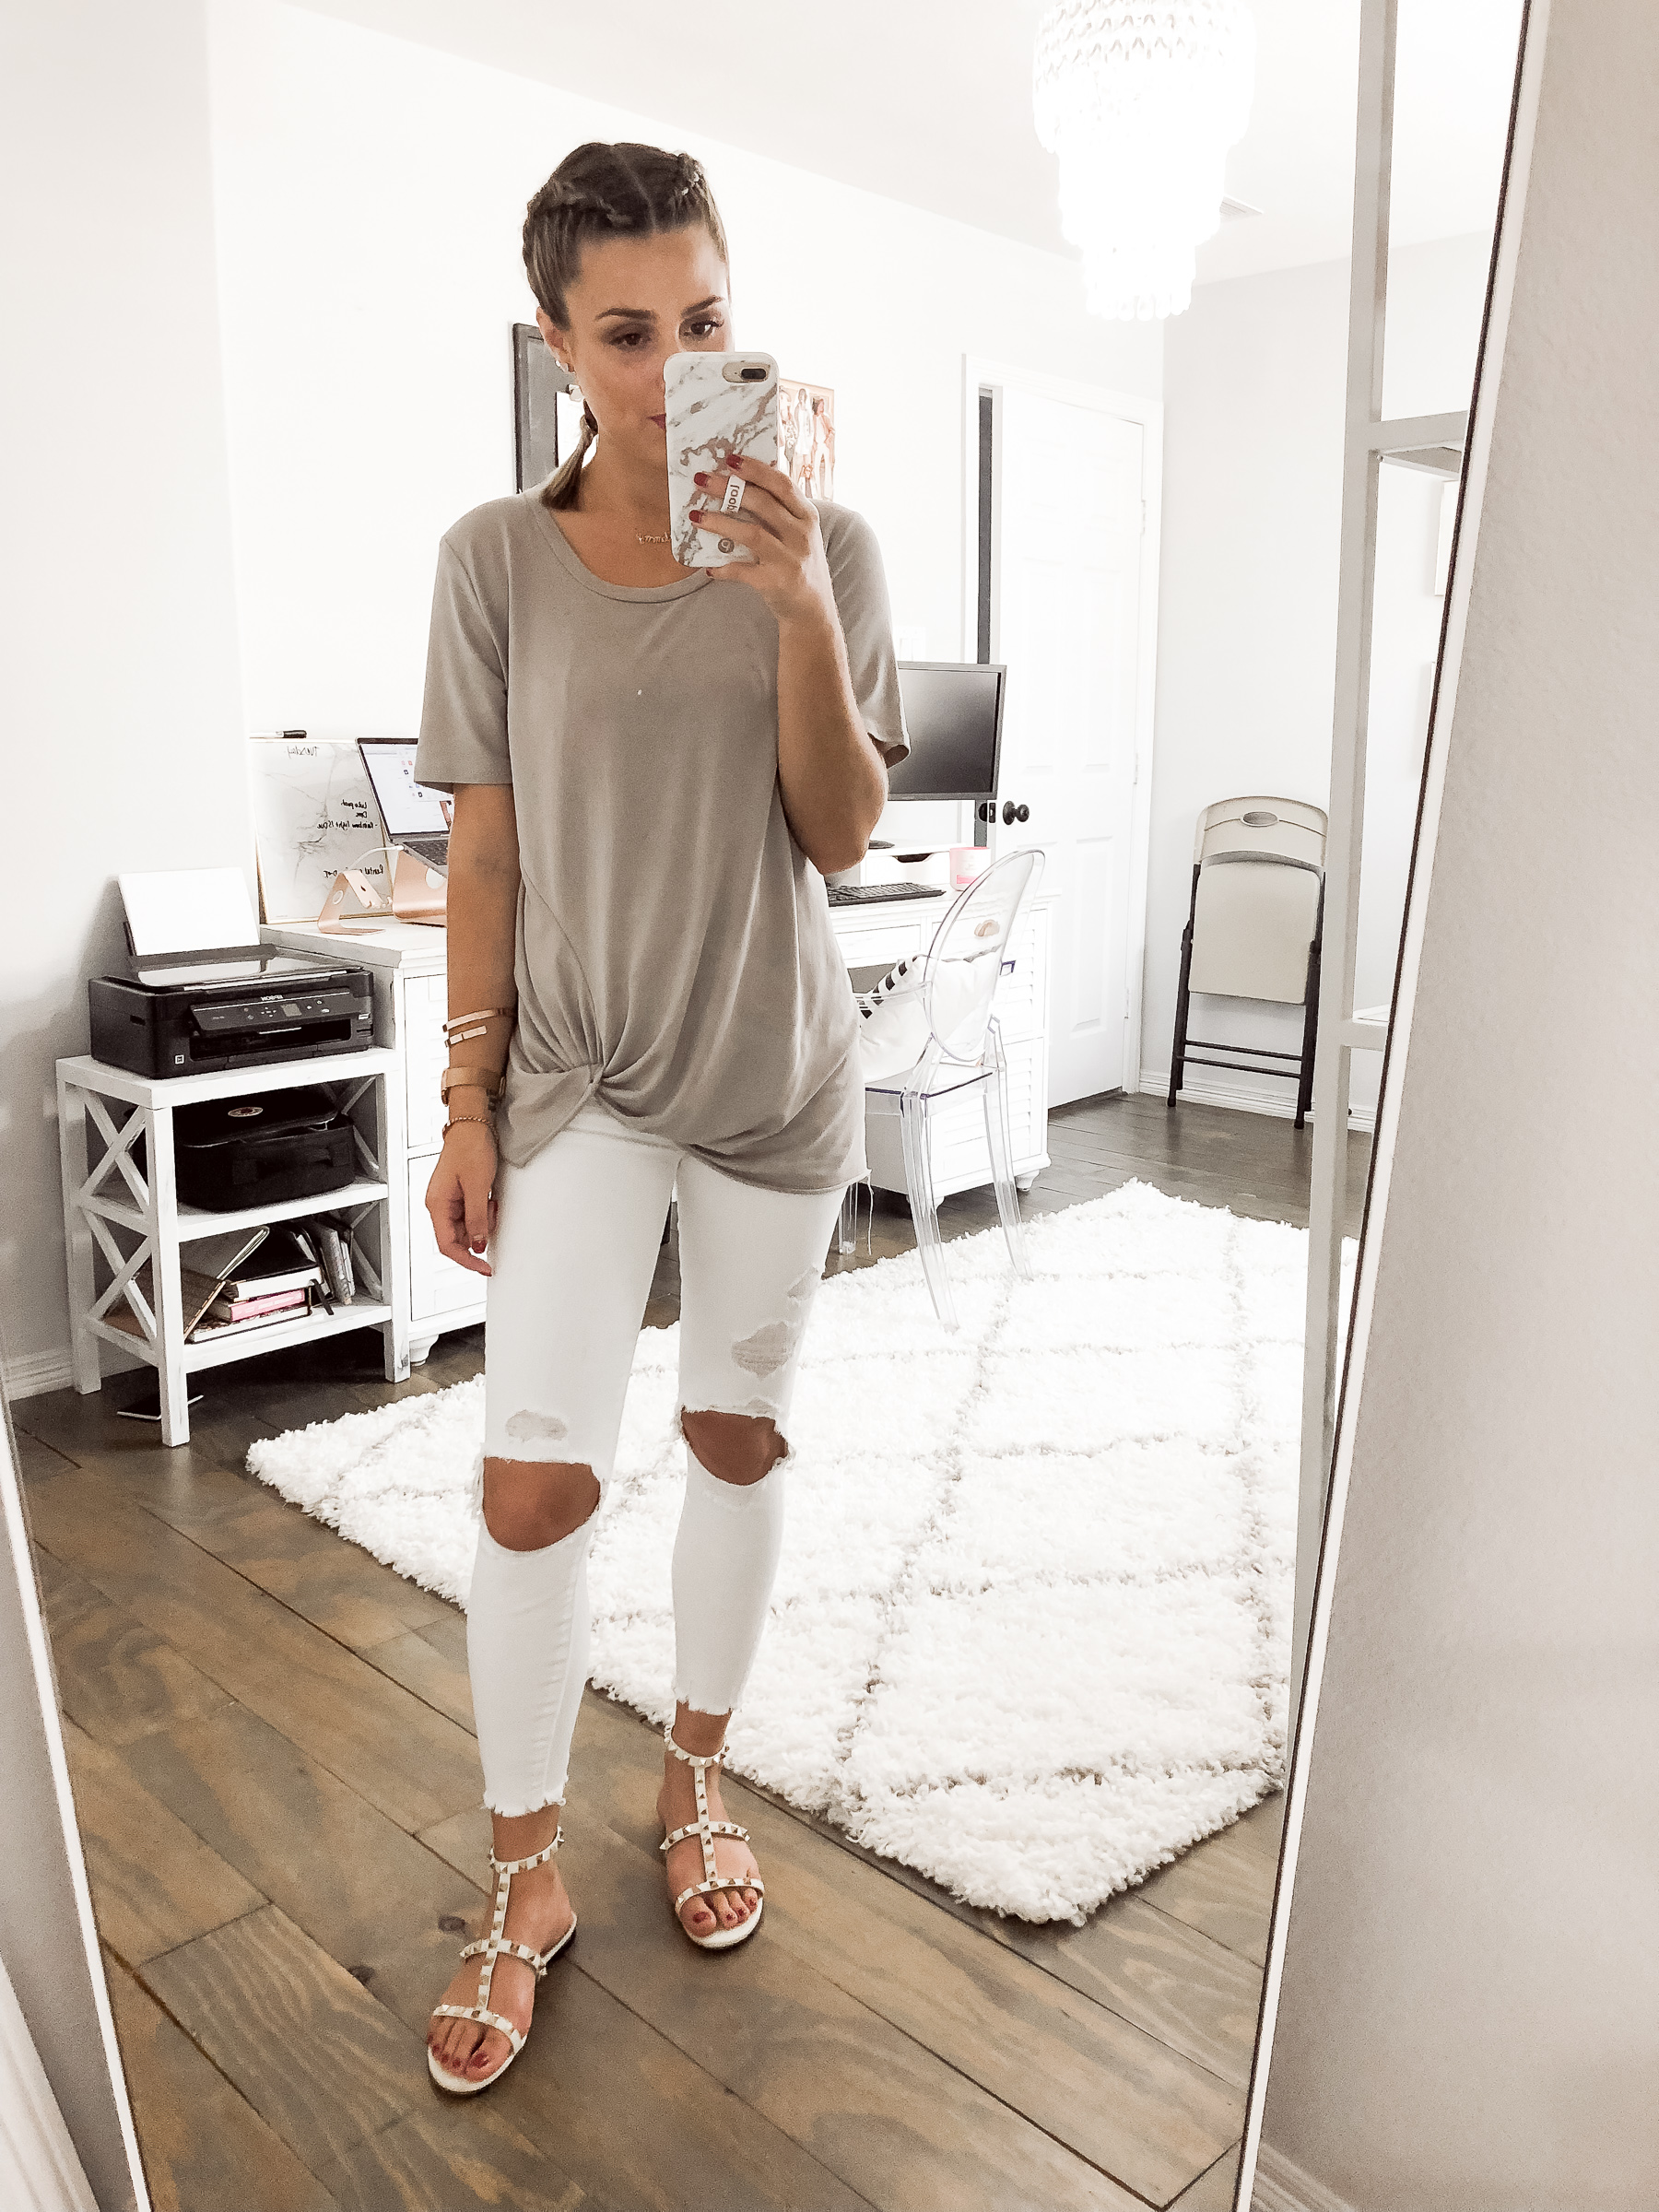 Houston fashion blogger Uptown with Elly Brown wears white distressed denim